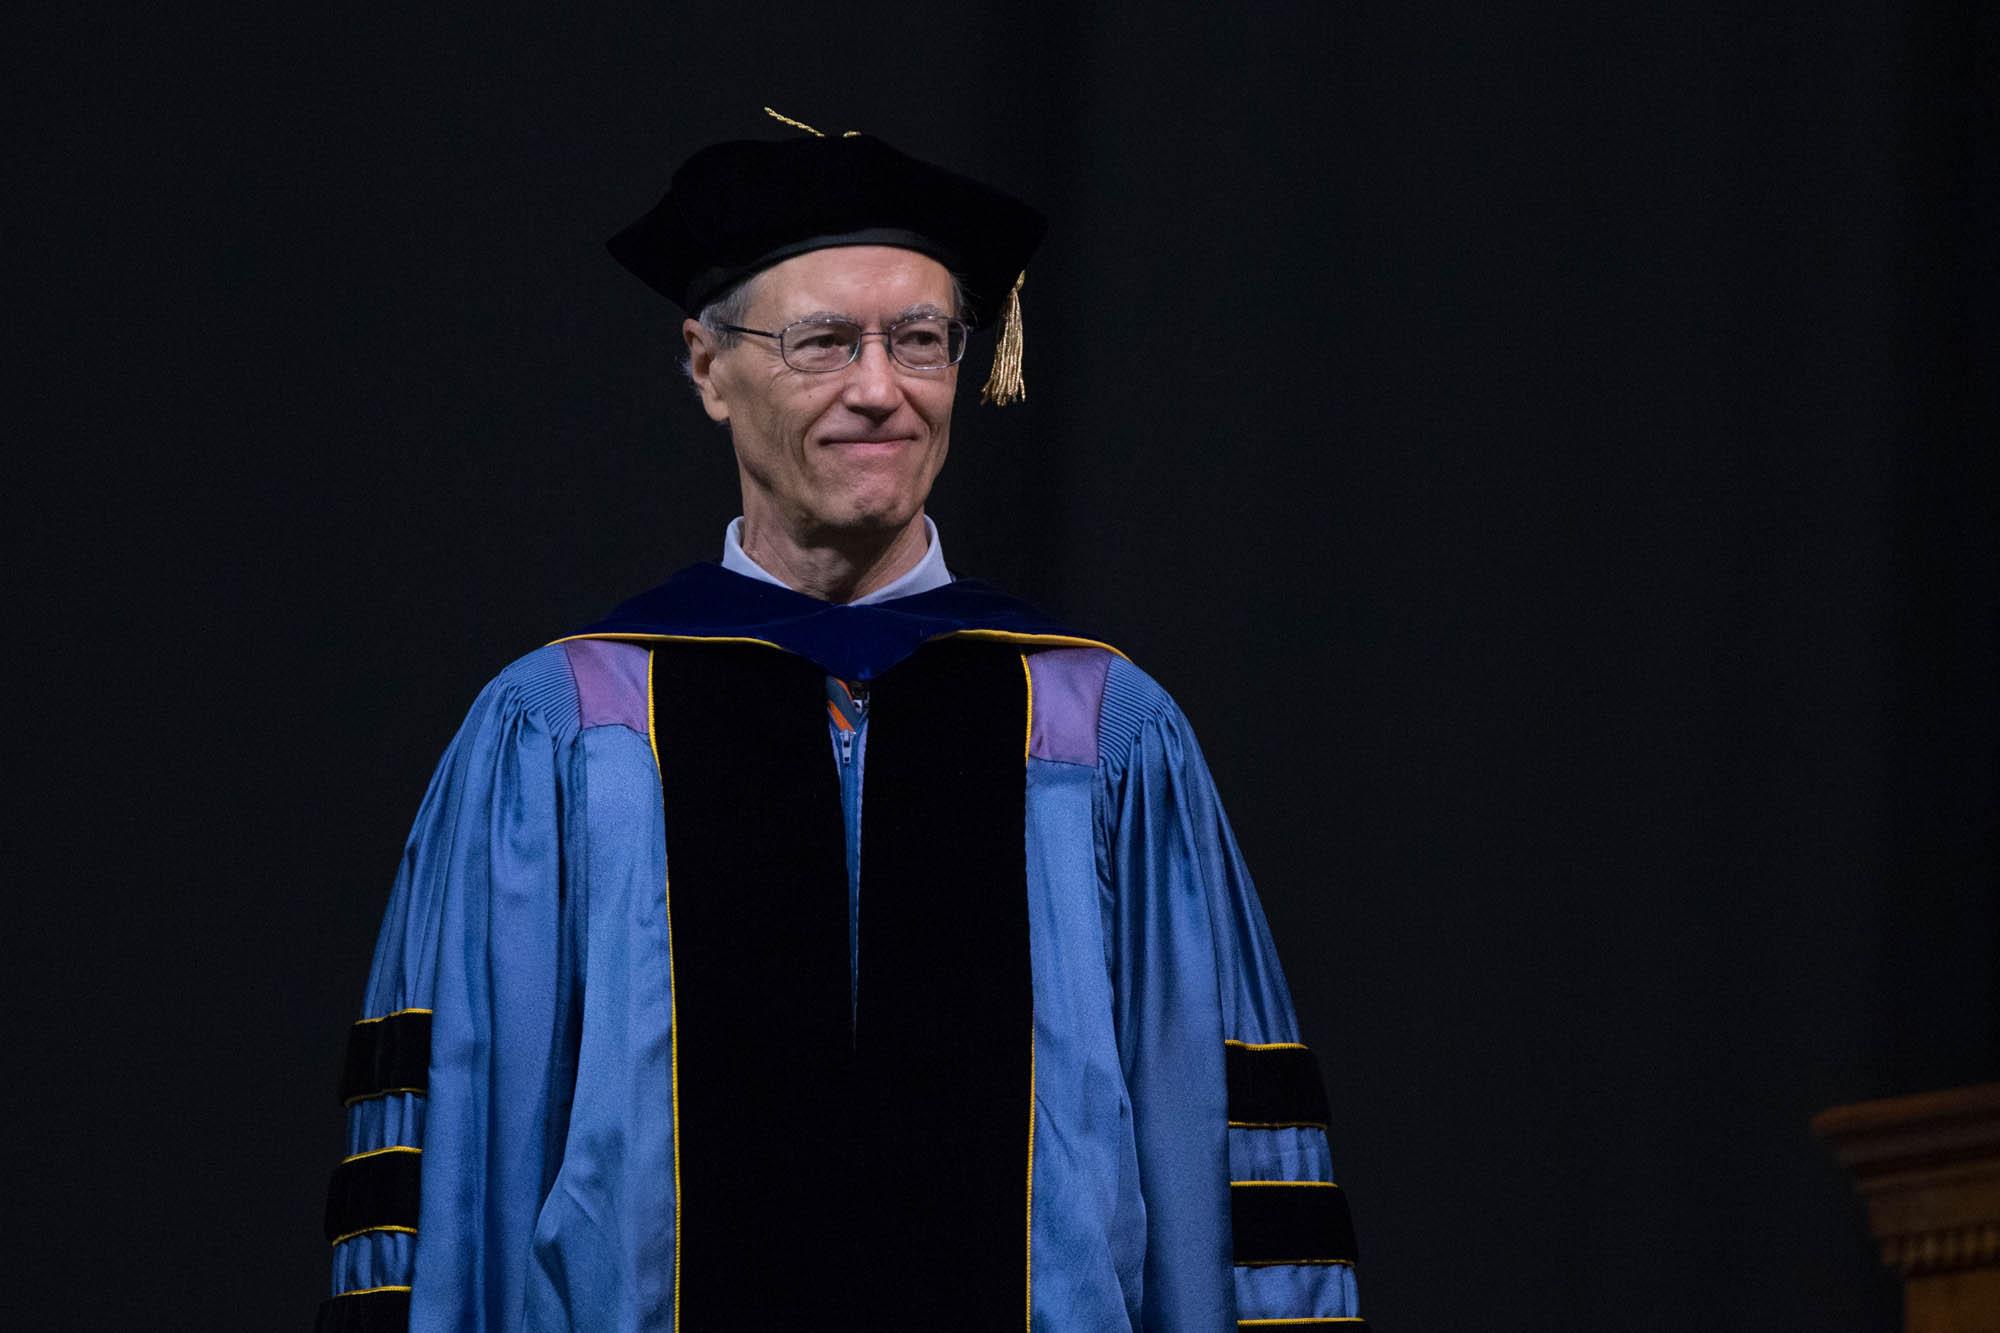 Professor Timothy D. Wilson